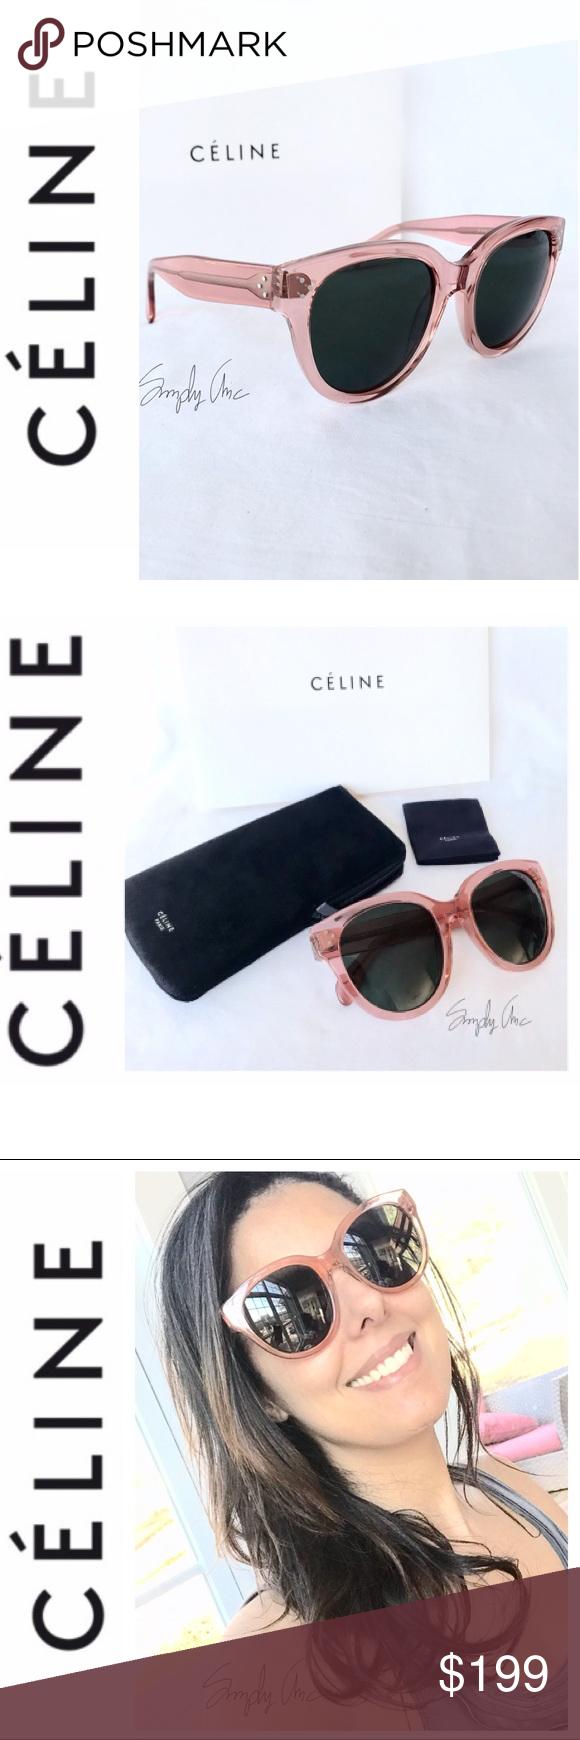 09c08ec6f4 Super Chic Celine Fabulous Audrey sunglasses blush Spotted on many  celebrities